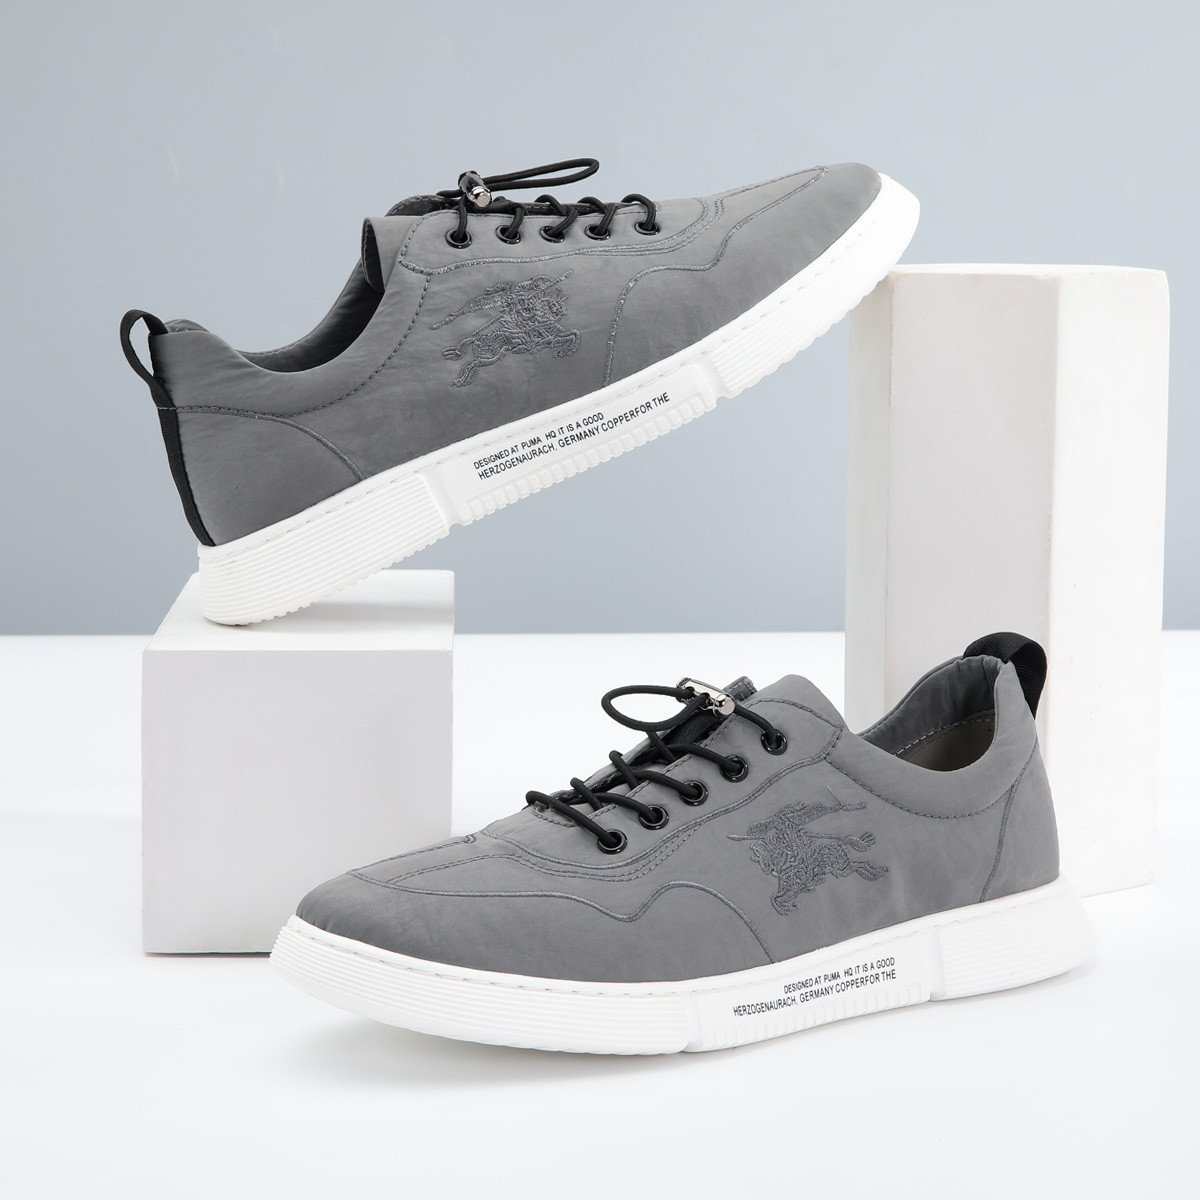 QGSG2019新款韩版刺绣透气男板鞋潮流男士休闲鞋百搭男款帆布鞋男鞋Q9C06011-B4